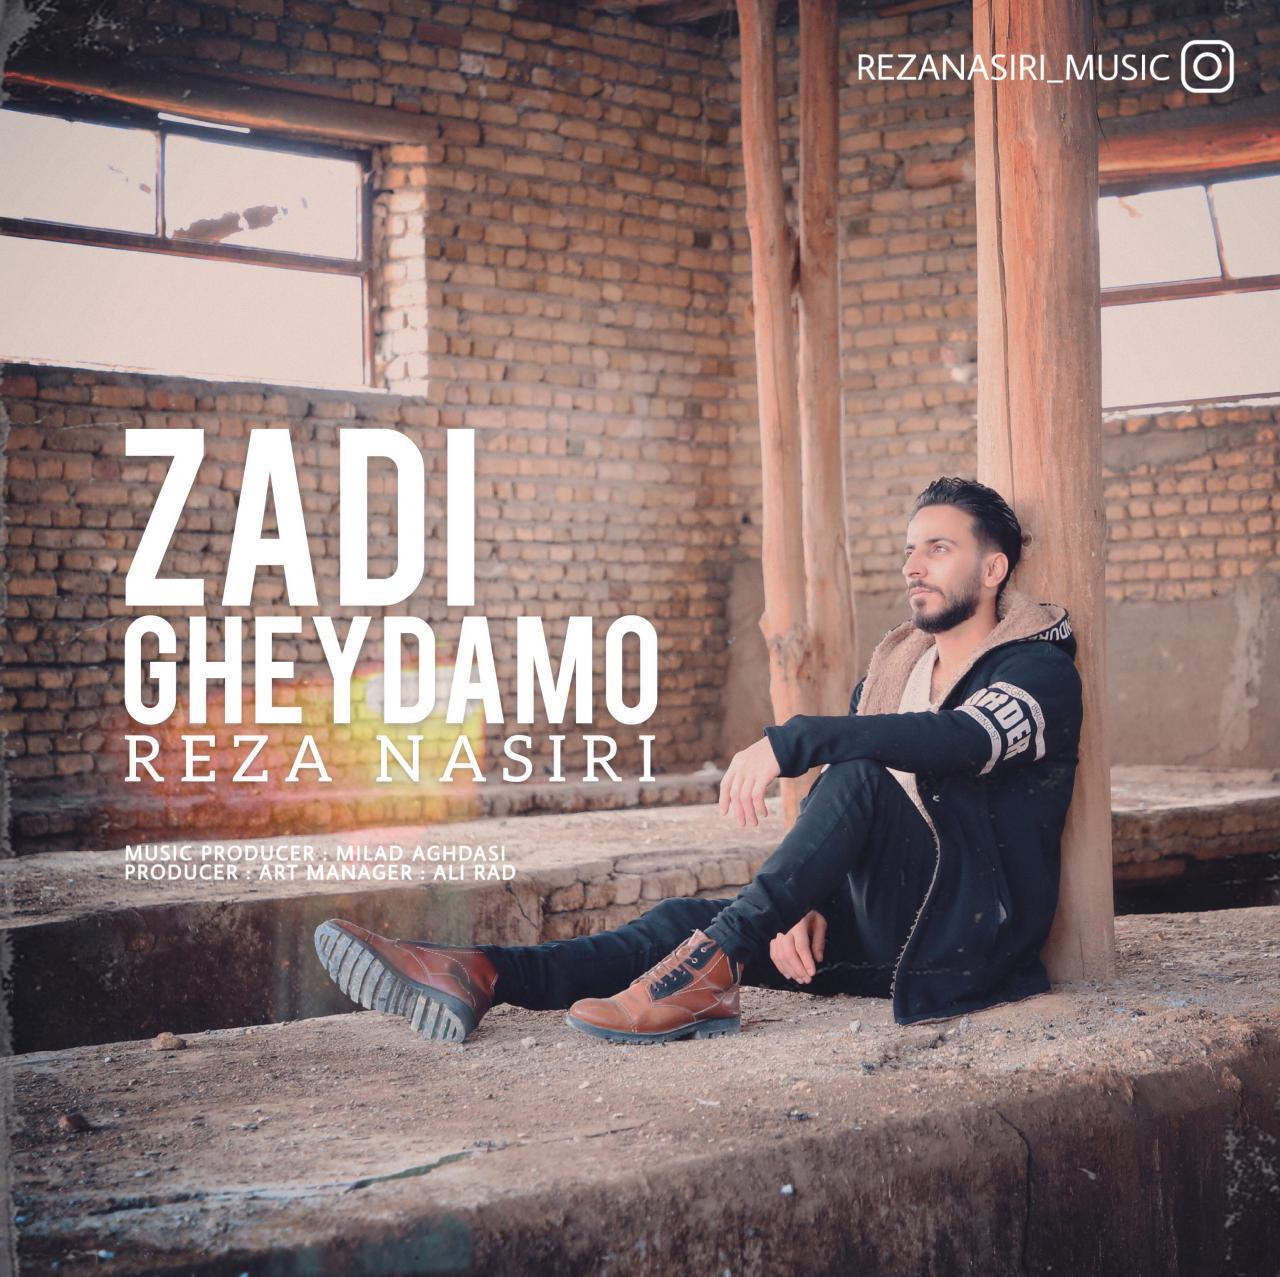 Reza Nasiri – Zadi Gheydamo